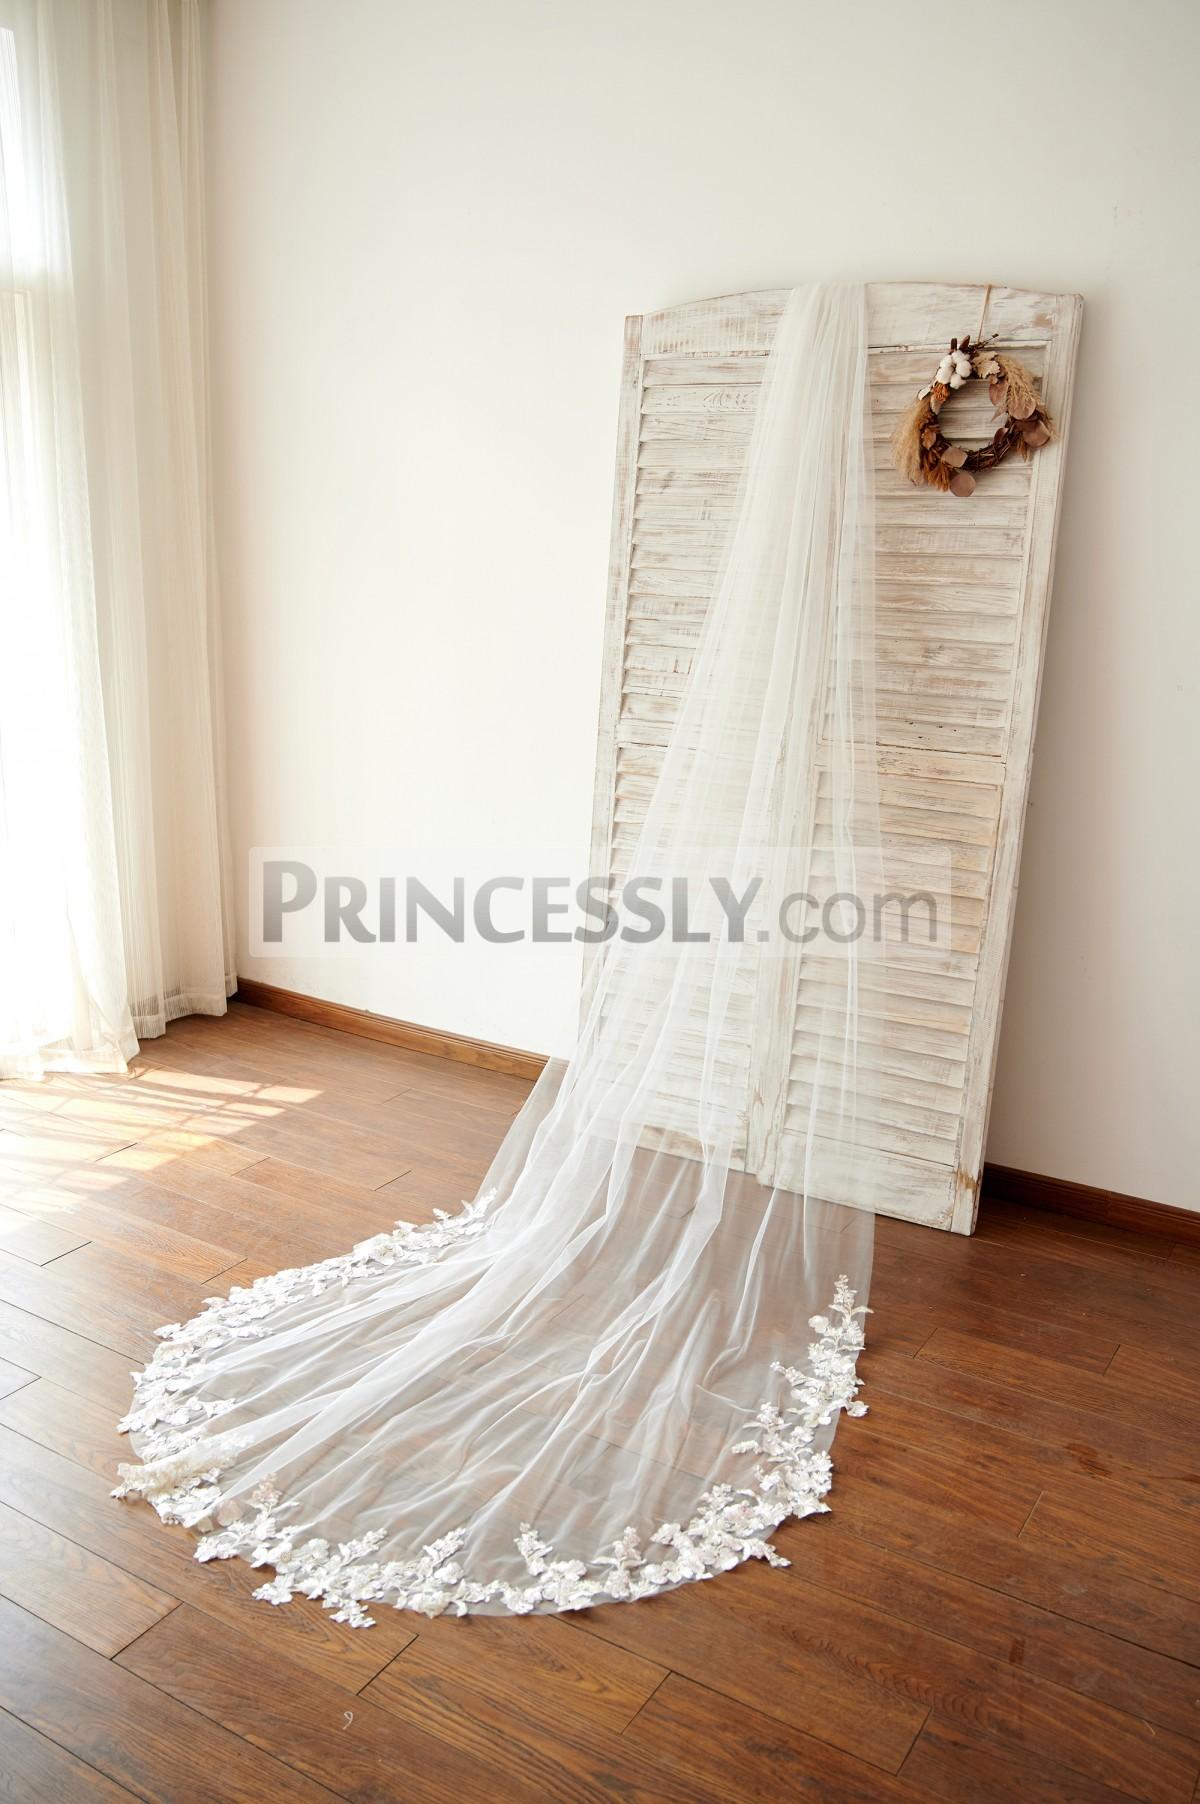 Princessly.com-K1003975-Ivory Champagne Lace Long Cathedral Wedding Bridal Veil-31